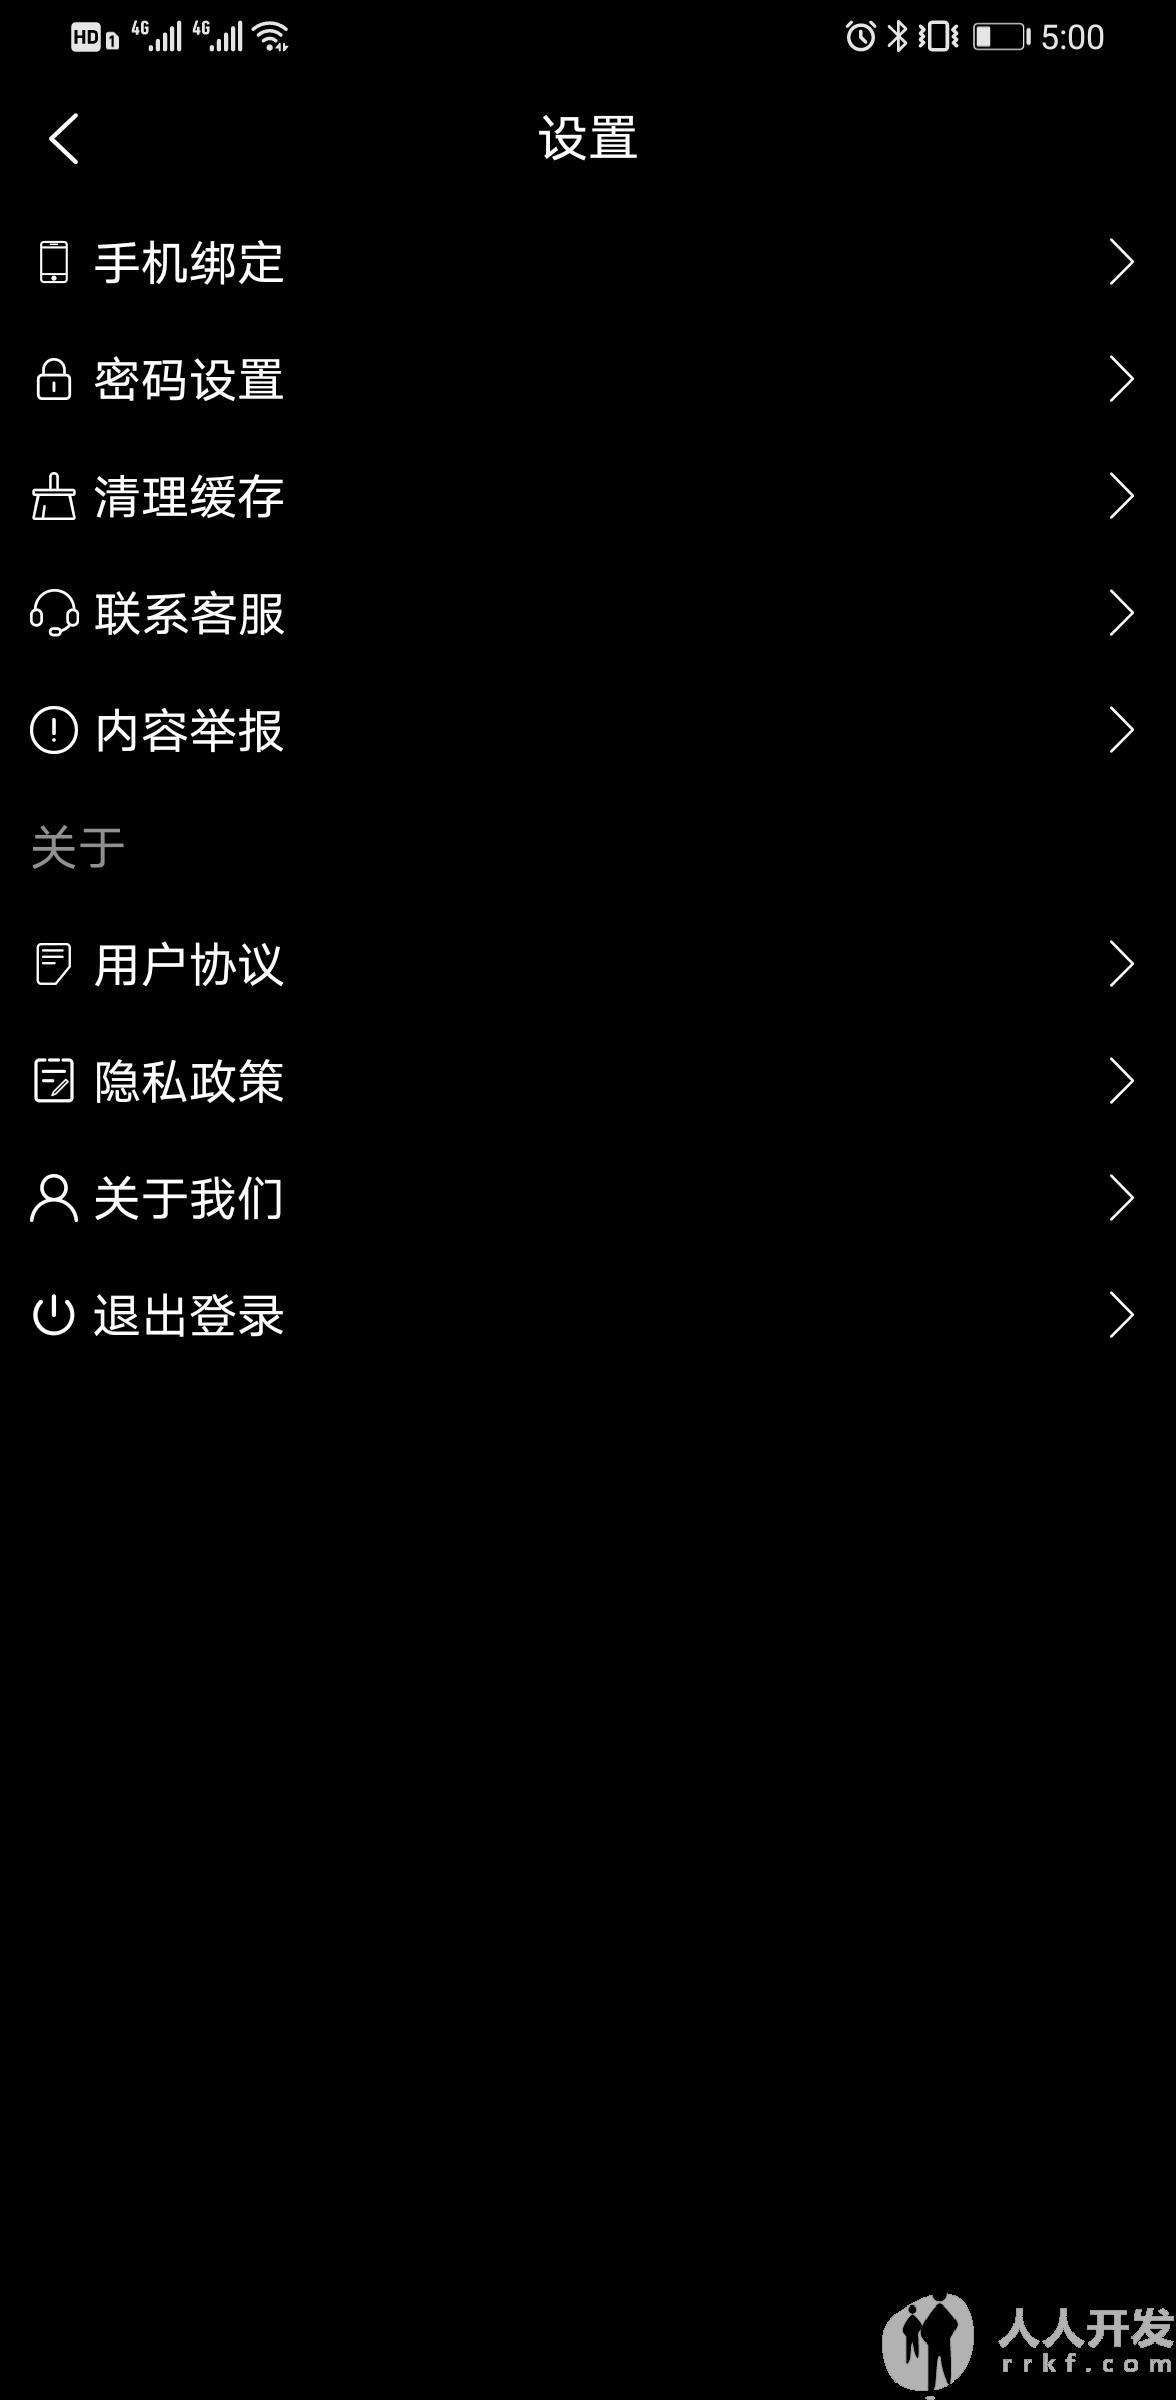 Screenshot_20210423_170027_com.yiyuanyoudao.app.jpg